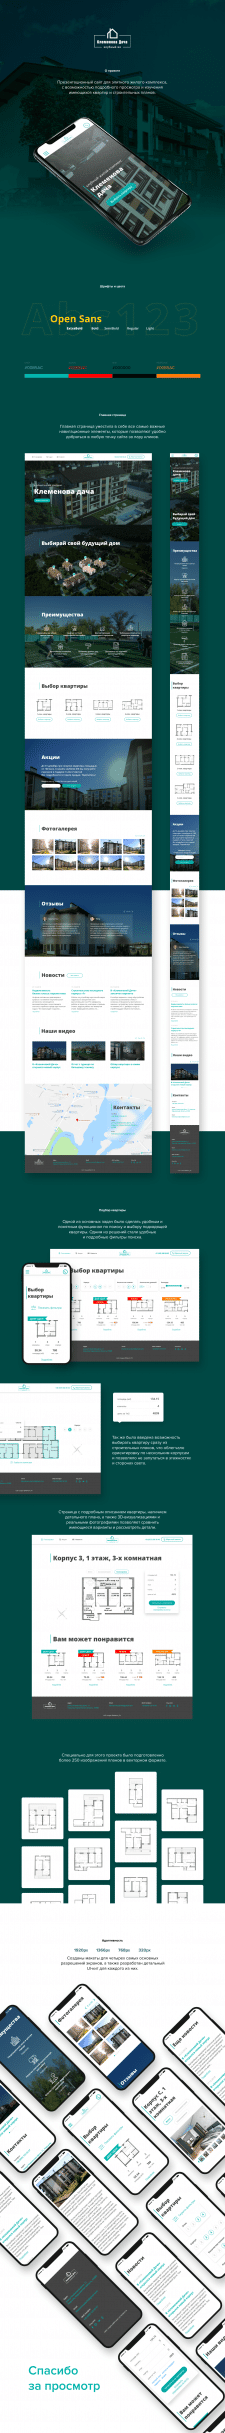 Дизайн сайта «Клеменова дача»